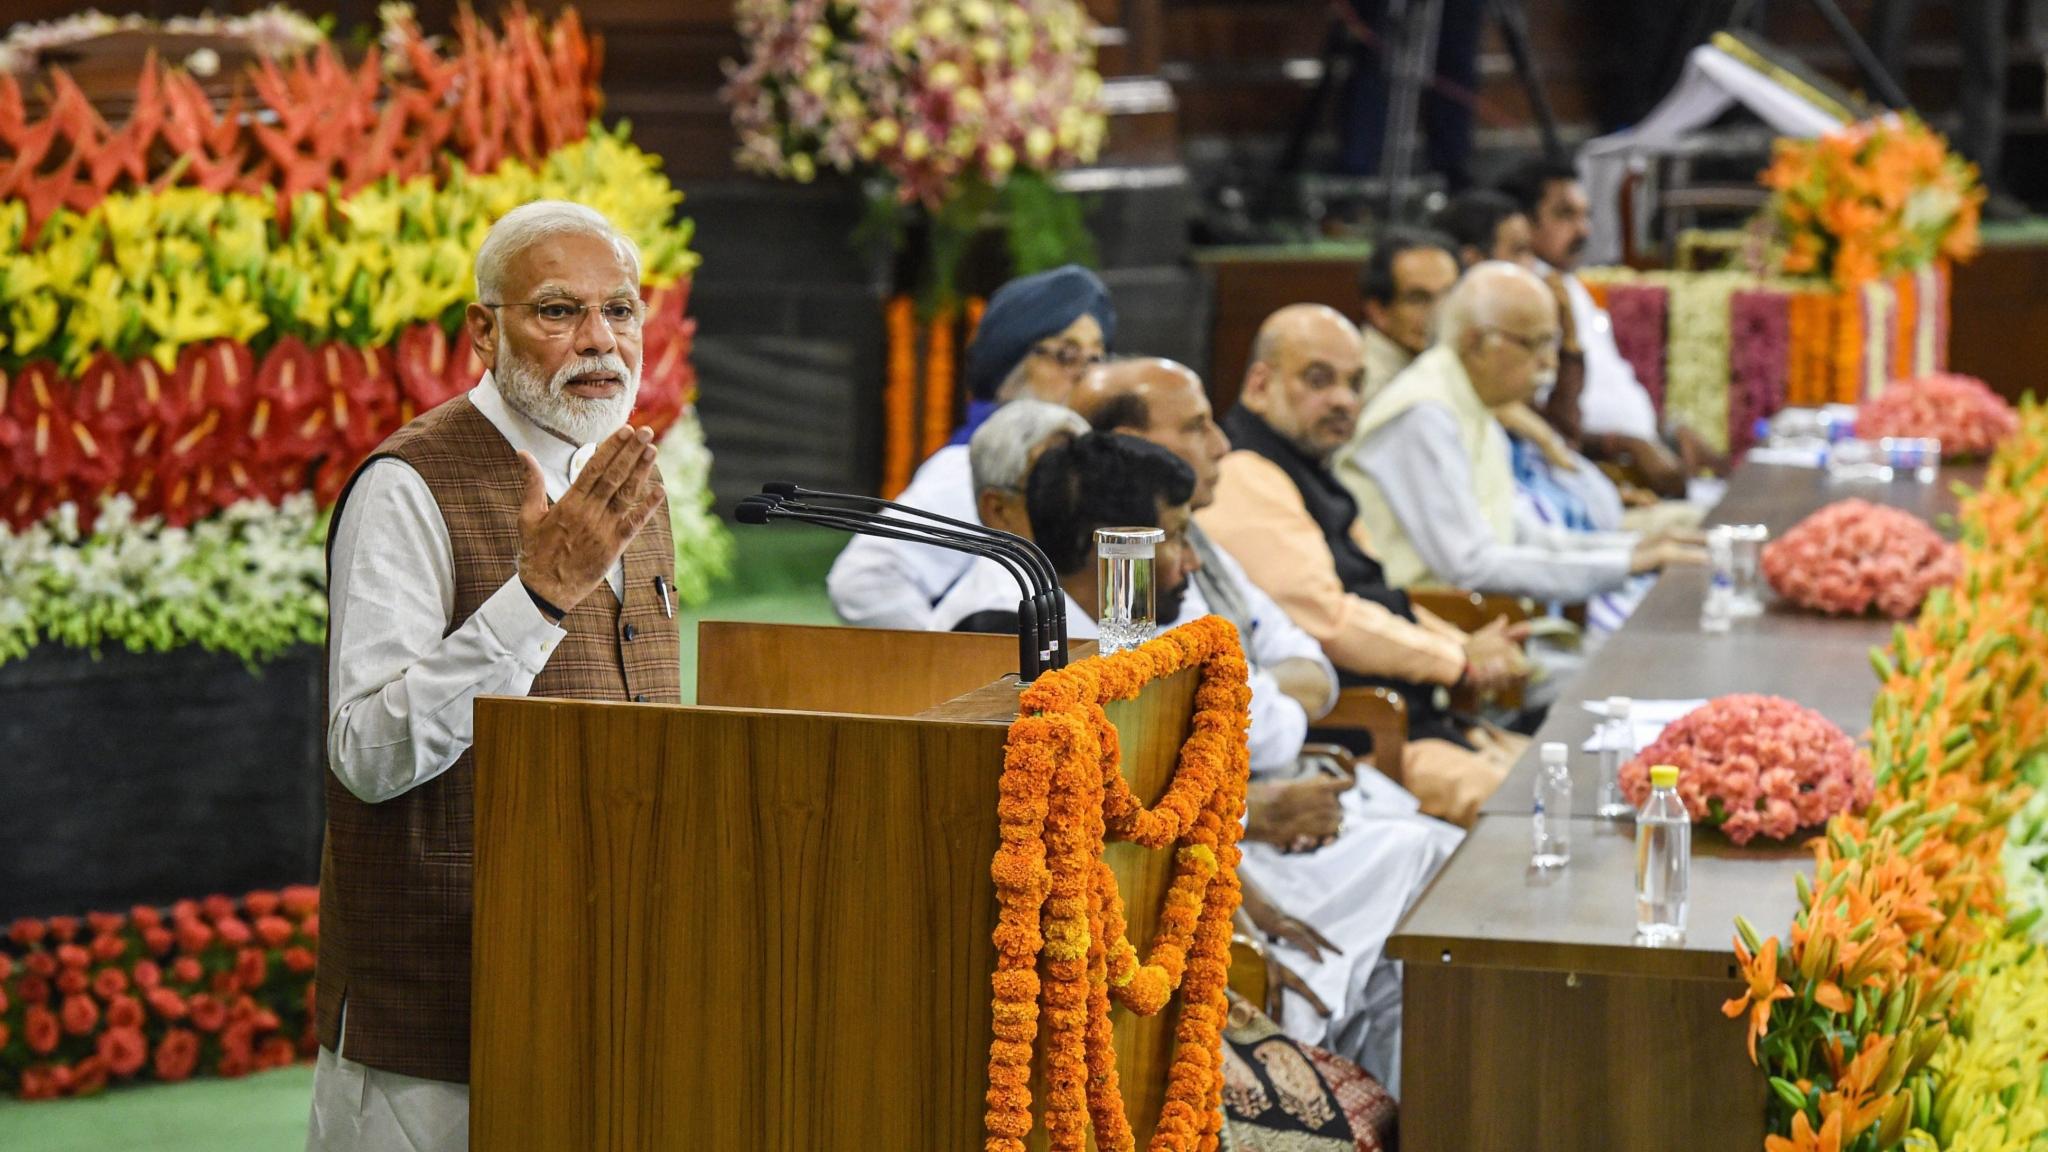 Modi Cabinet 2019 live updates: Sonia, Rahul Gandhi to Attend Modi's